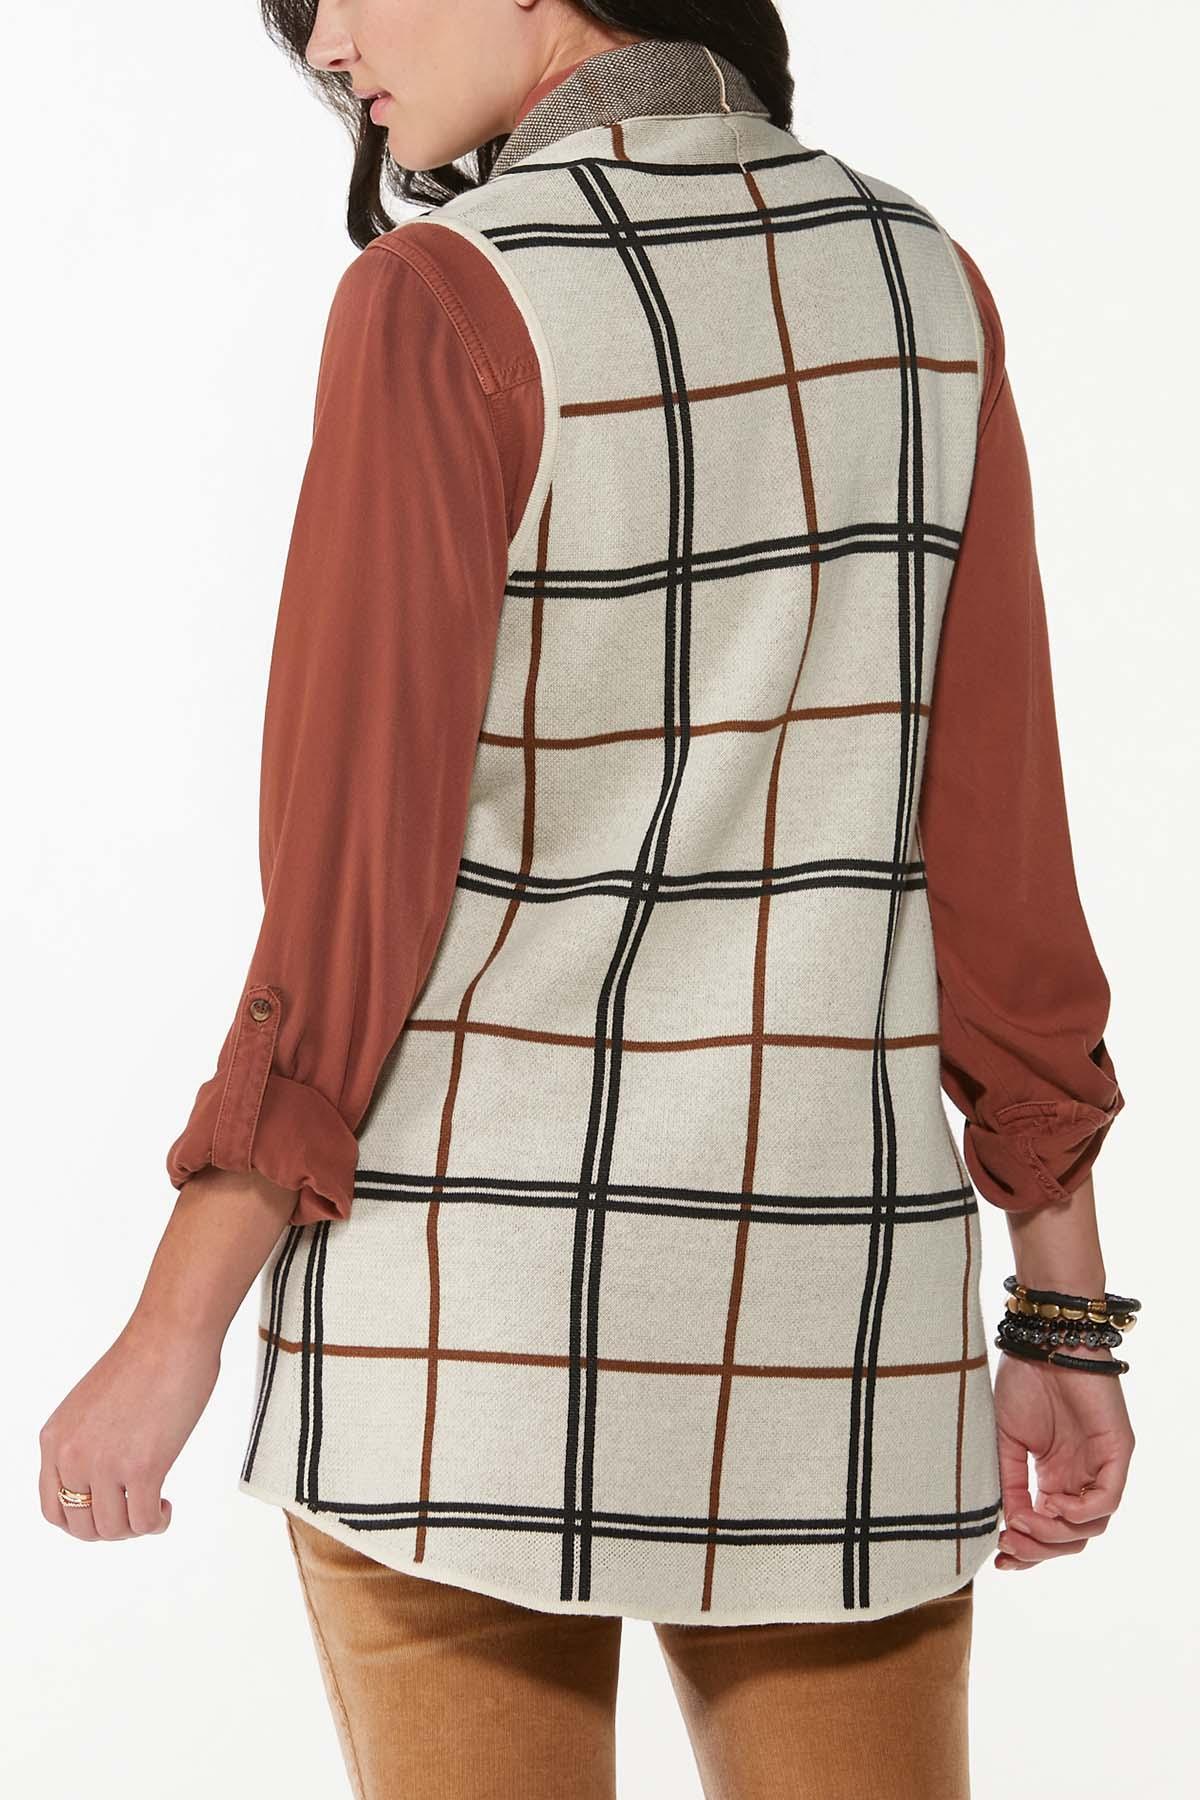 Jacquard Plaid Vest (Item #44700261)